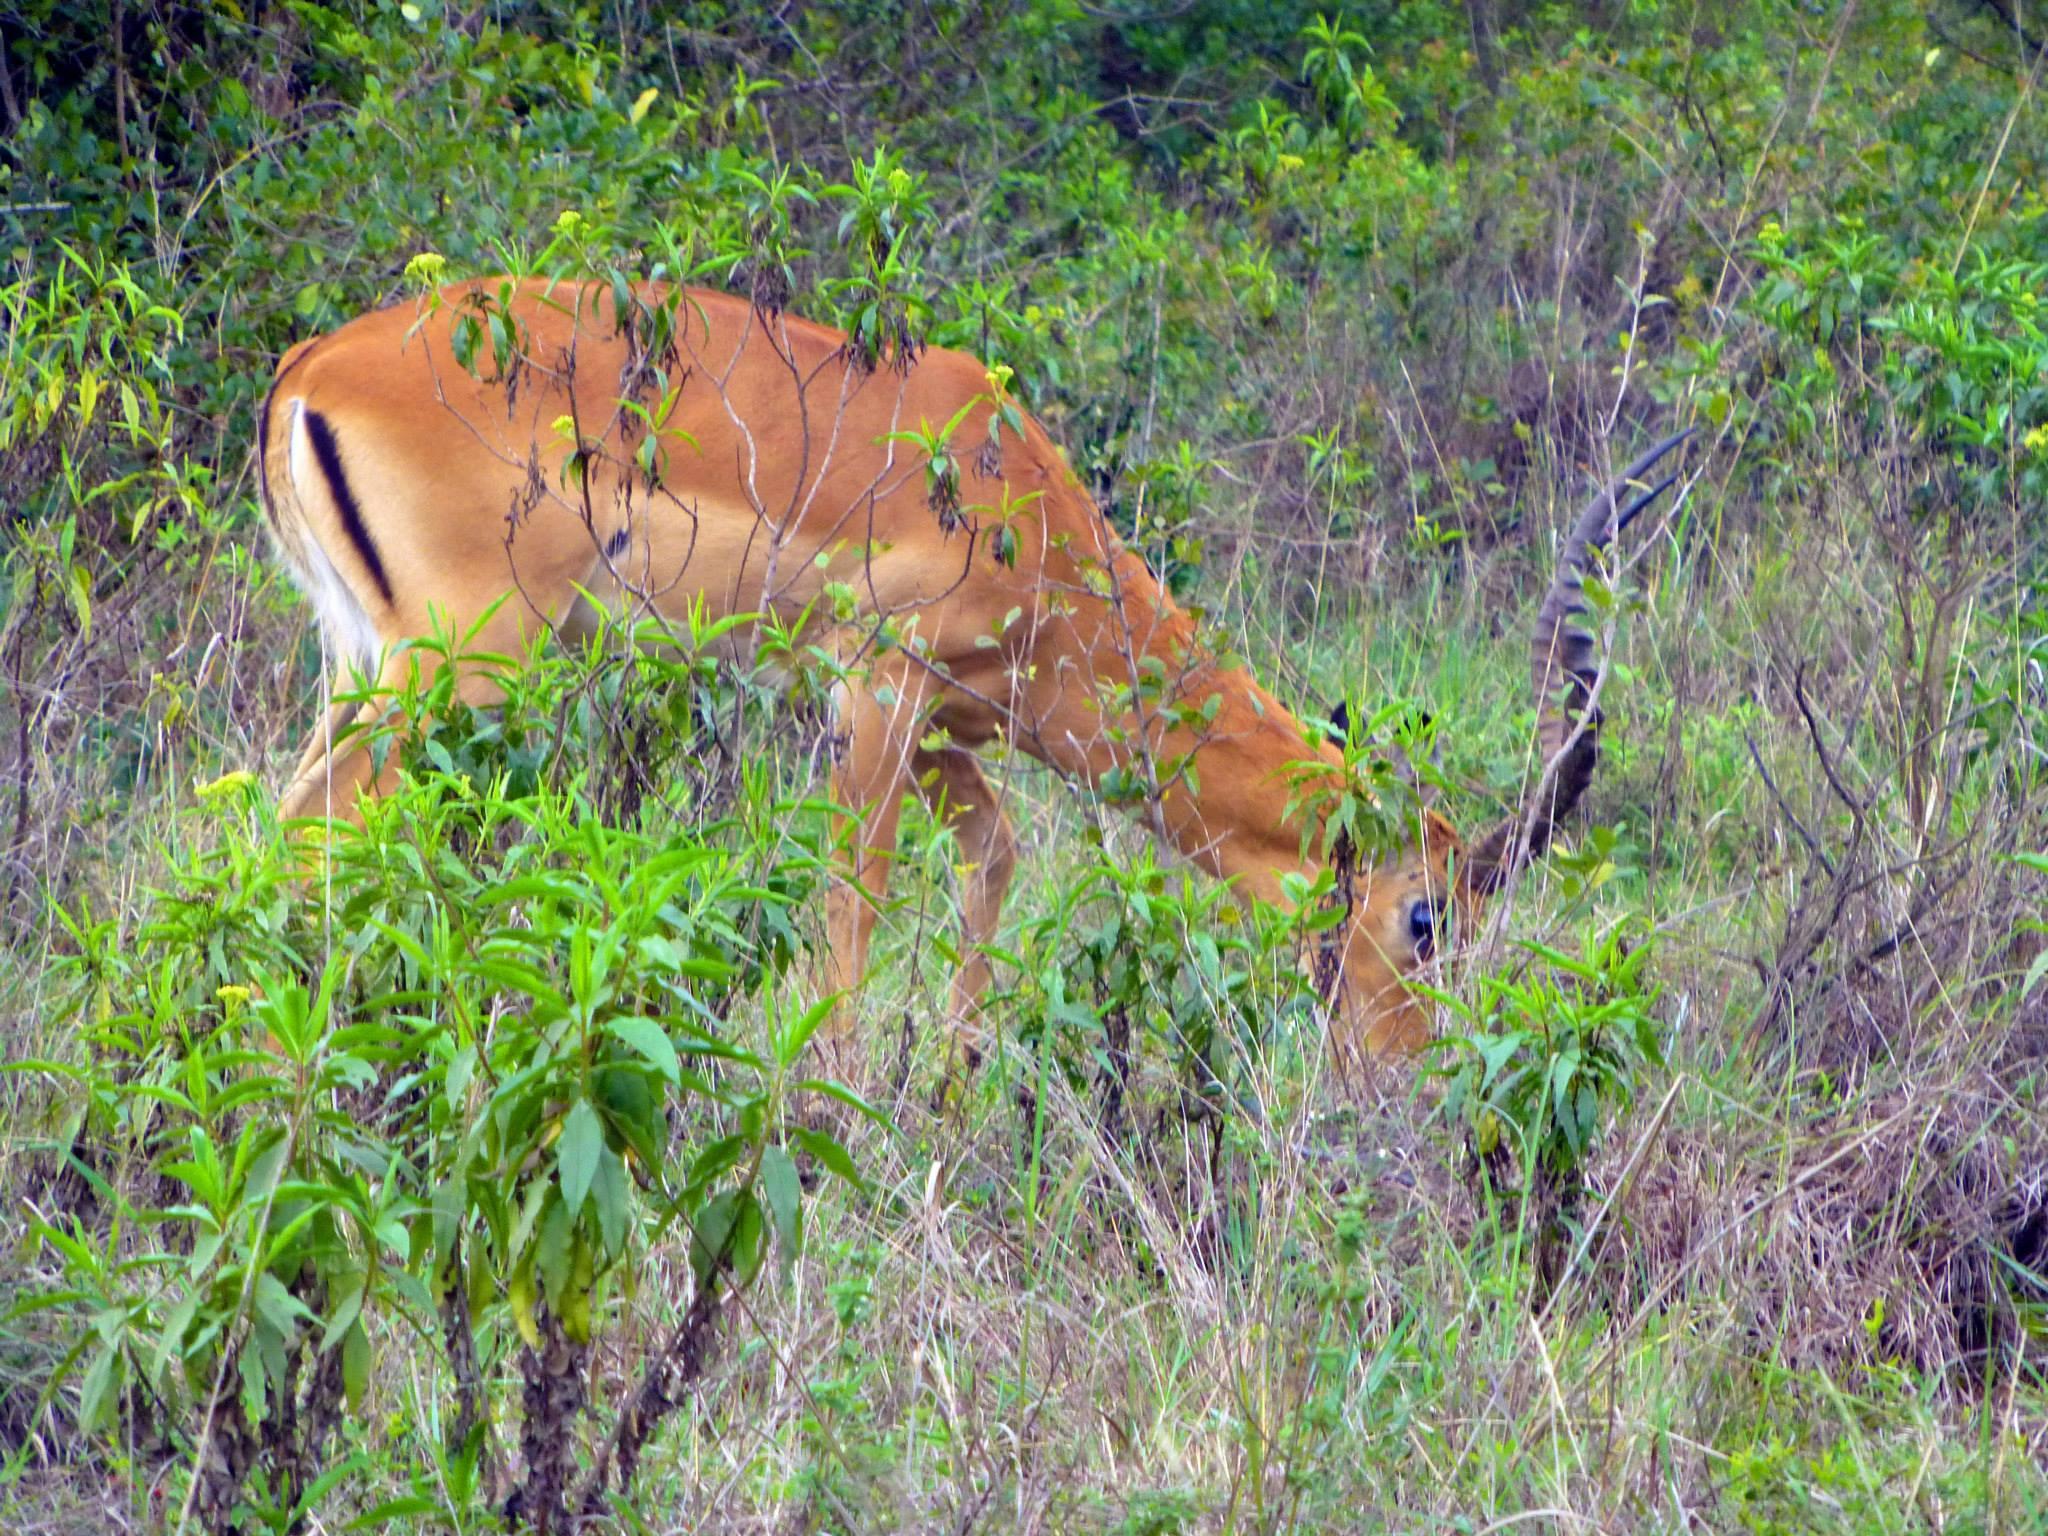 kenya safari gazelle